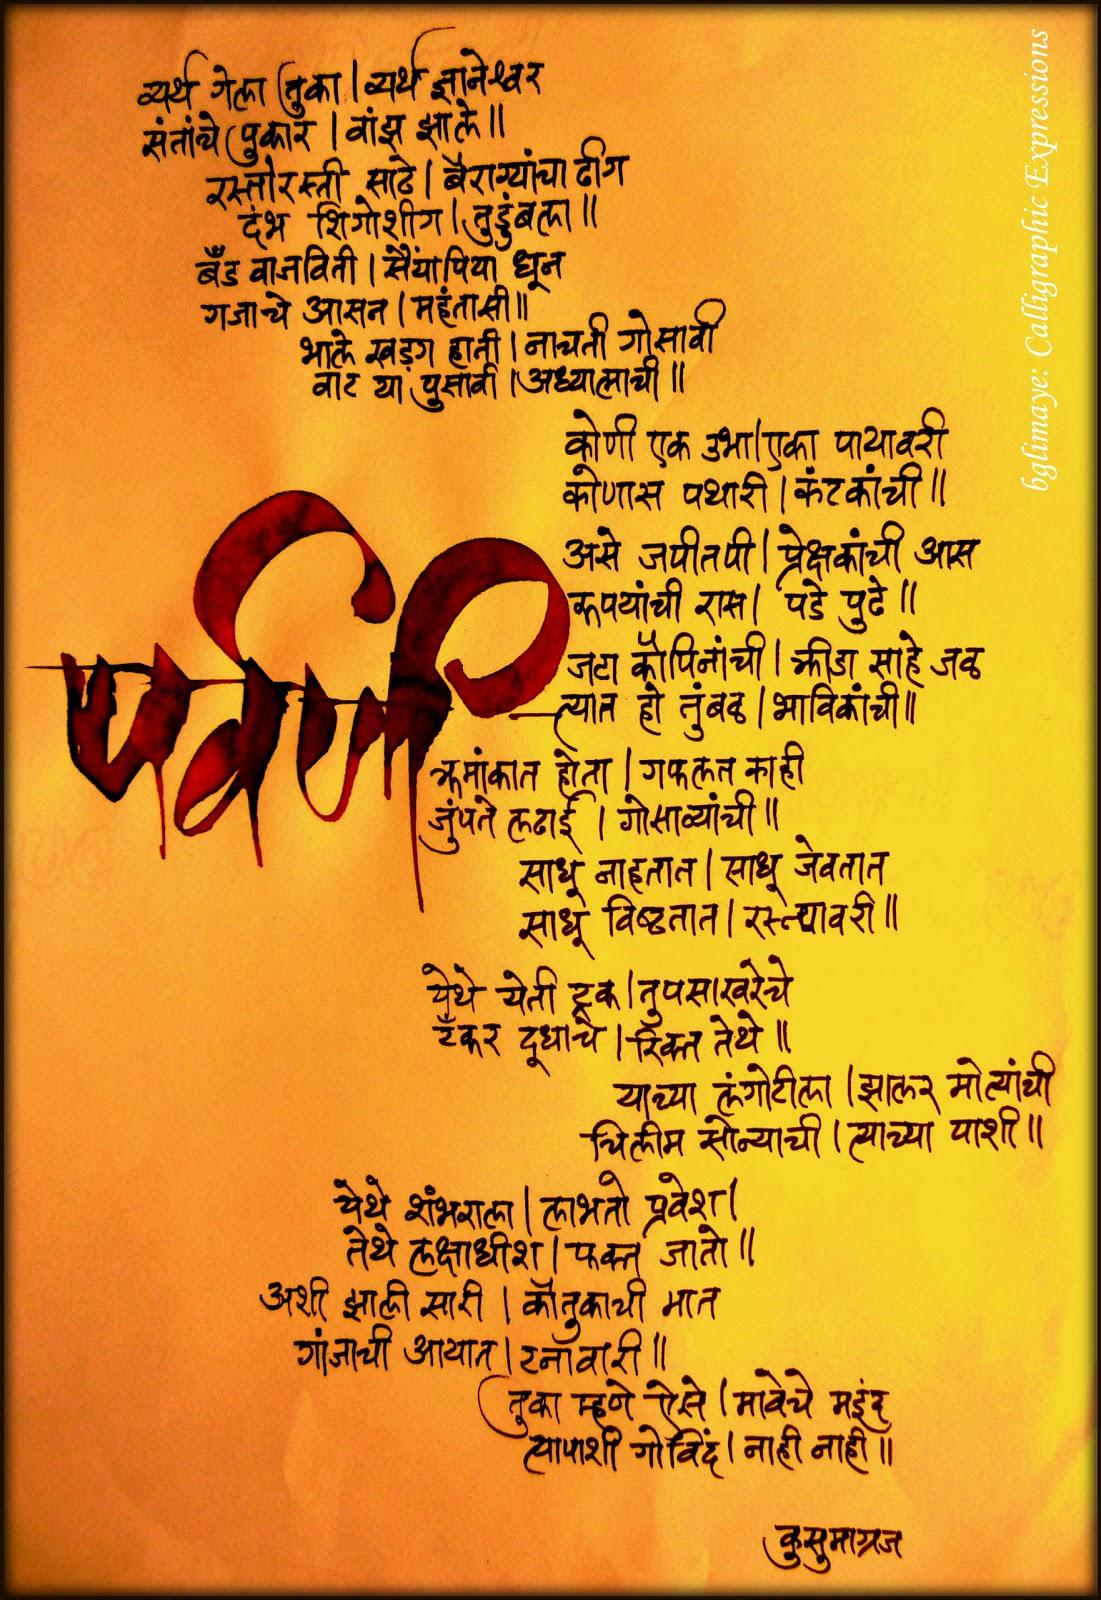 Pin Download Marathi Calligraphy Fonts Free on Pinterest